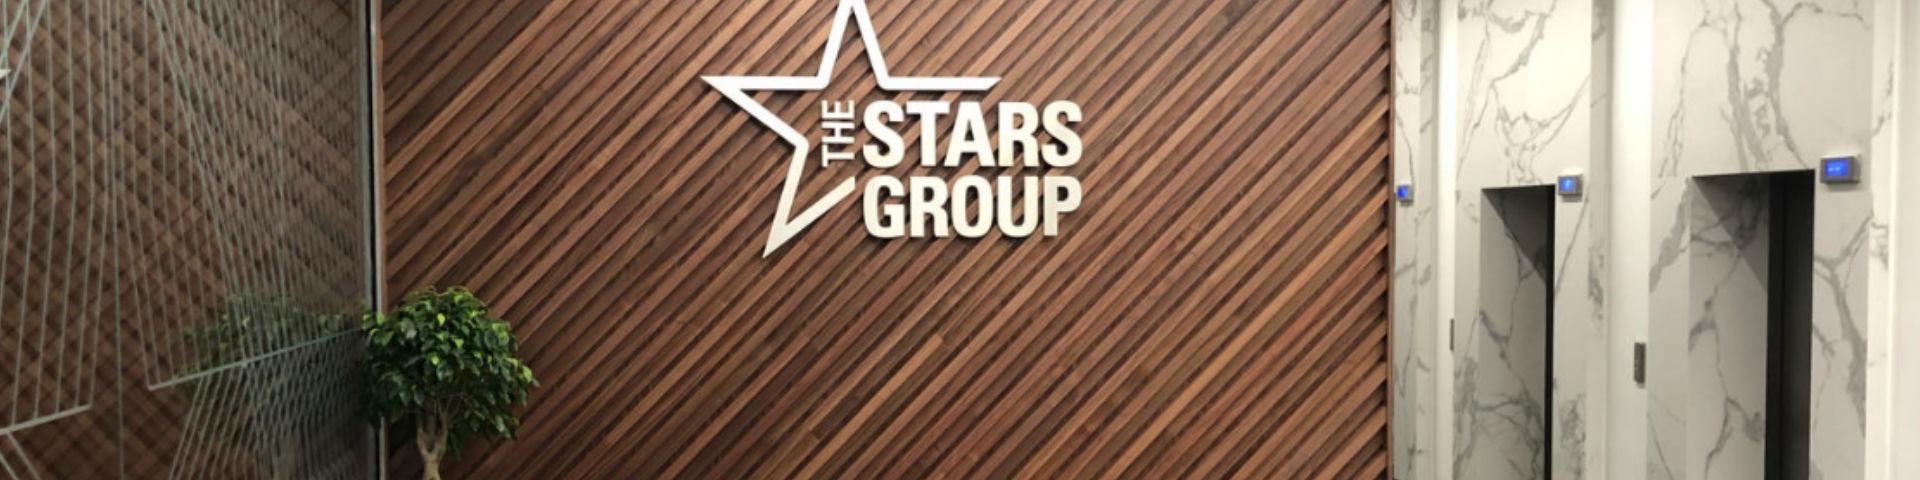 Flutter Entertainment и The Stars Group заключили договор о слиянии